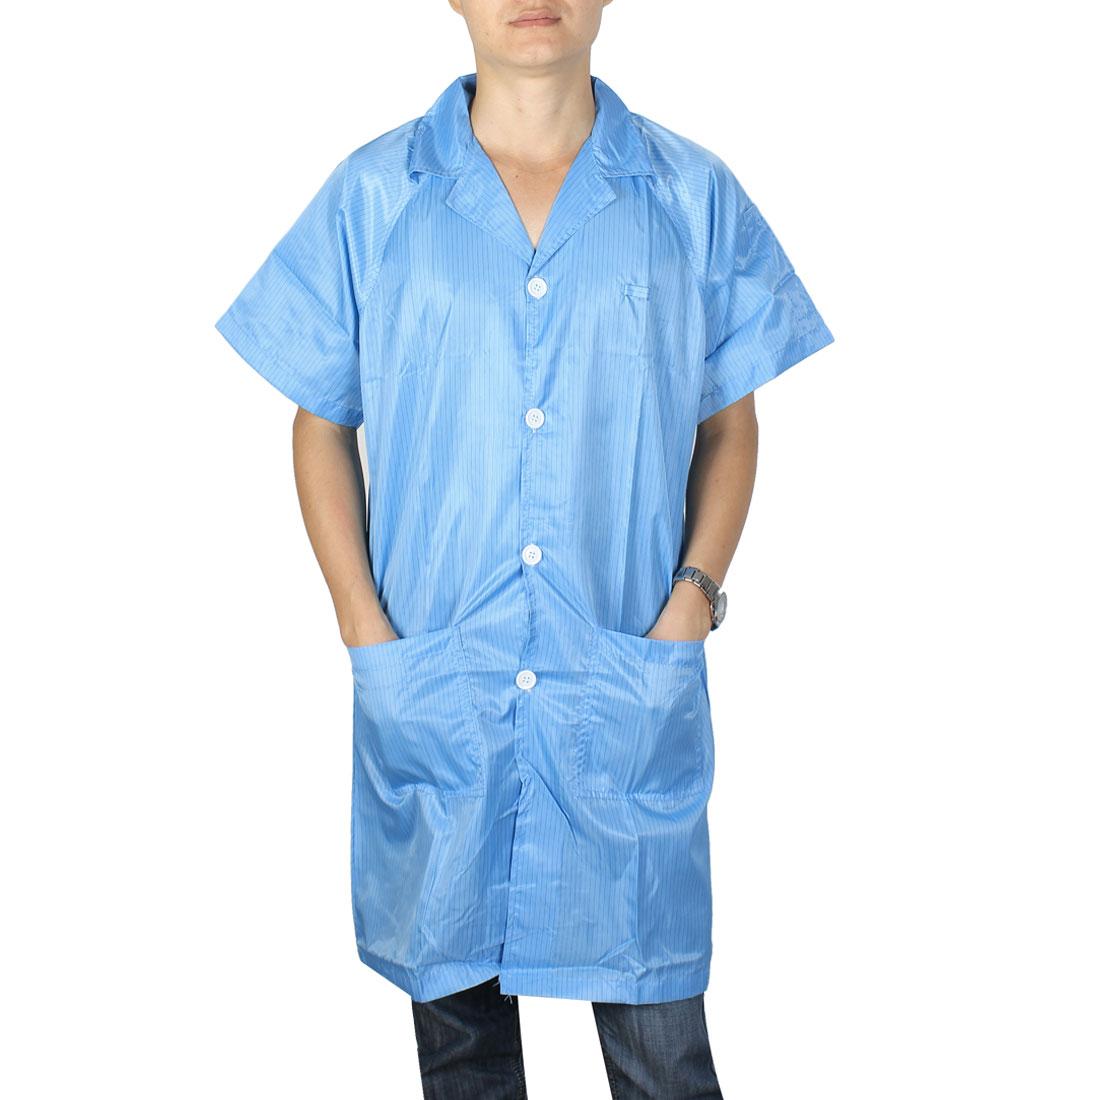 Women Men Lapel Collar Button Up ESD Lab Anti Static Overalls Coat Uniform Blue XXL